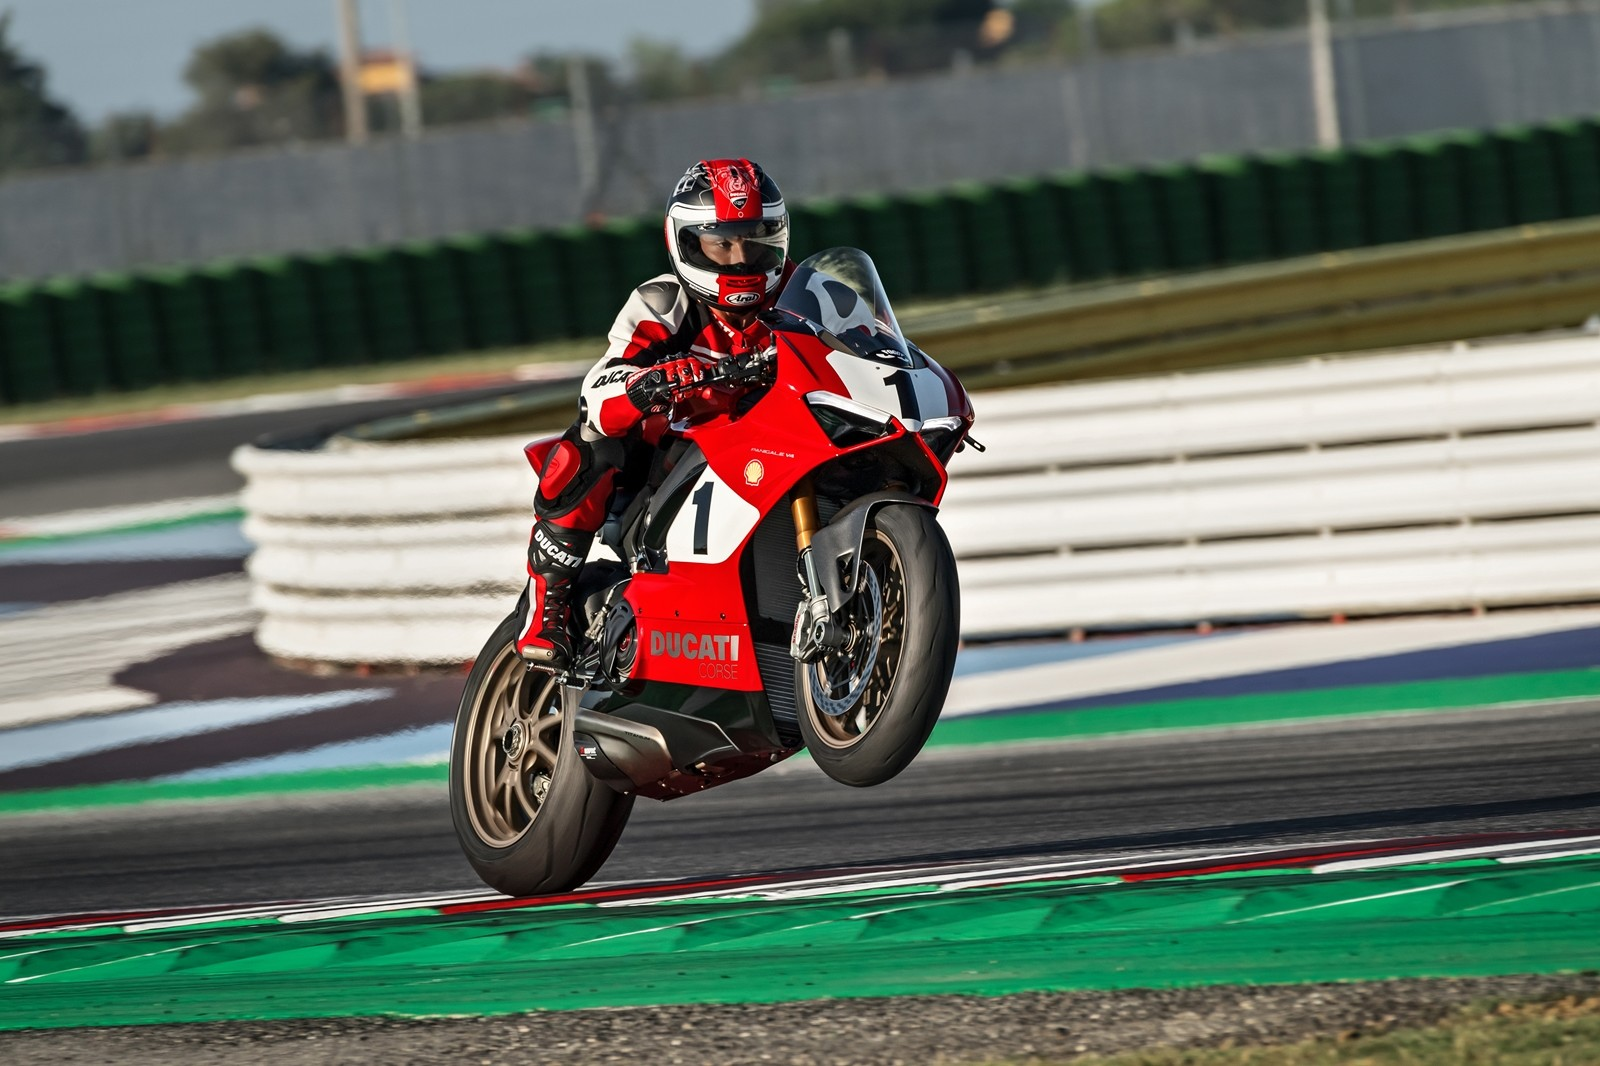 Ducati Panigale V4 25 Aniversario 916